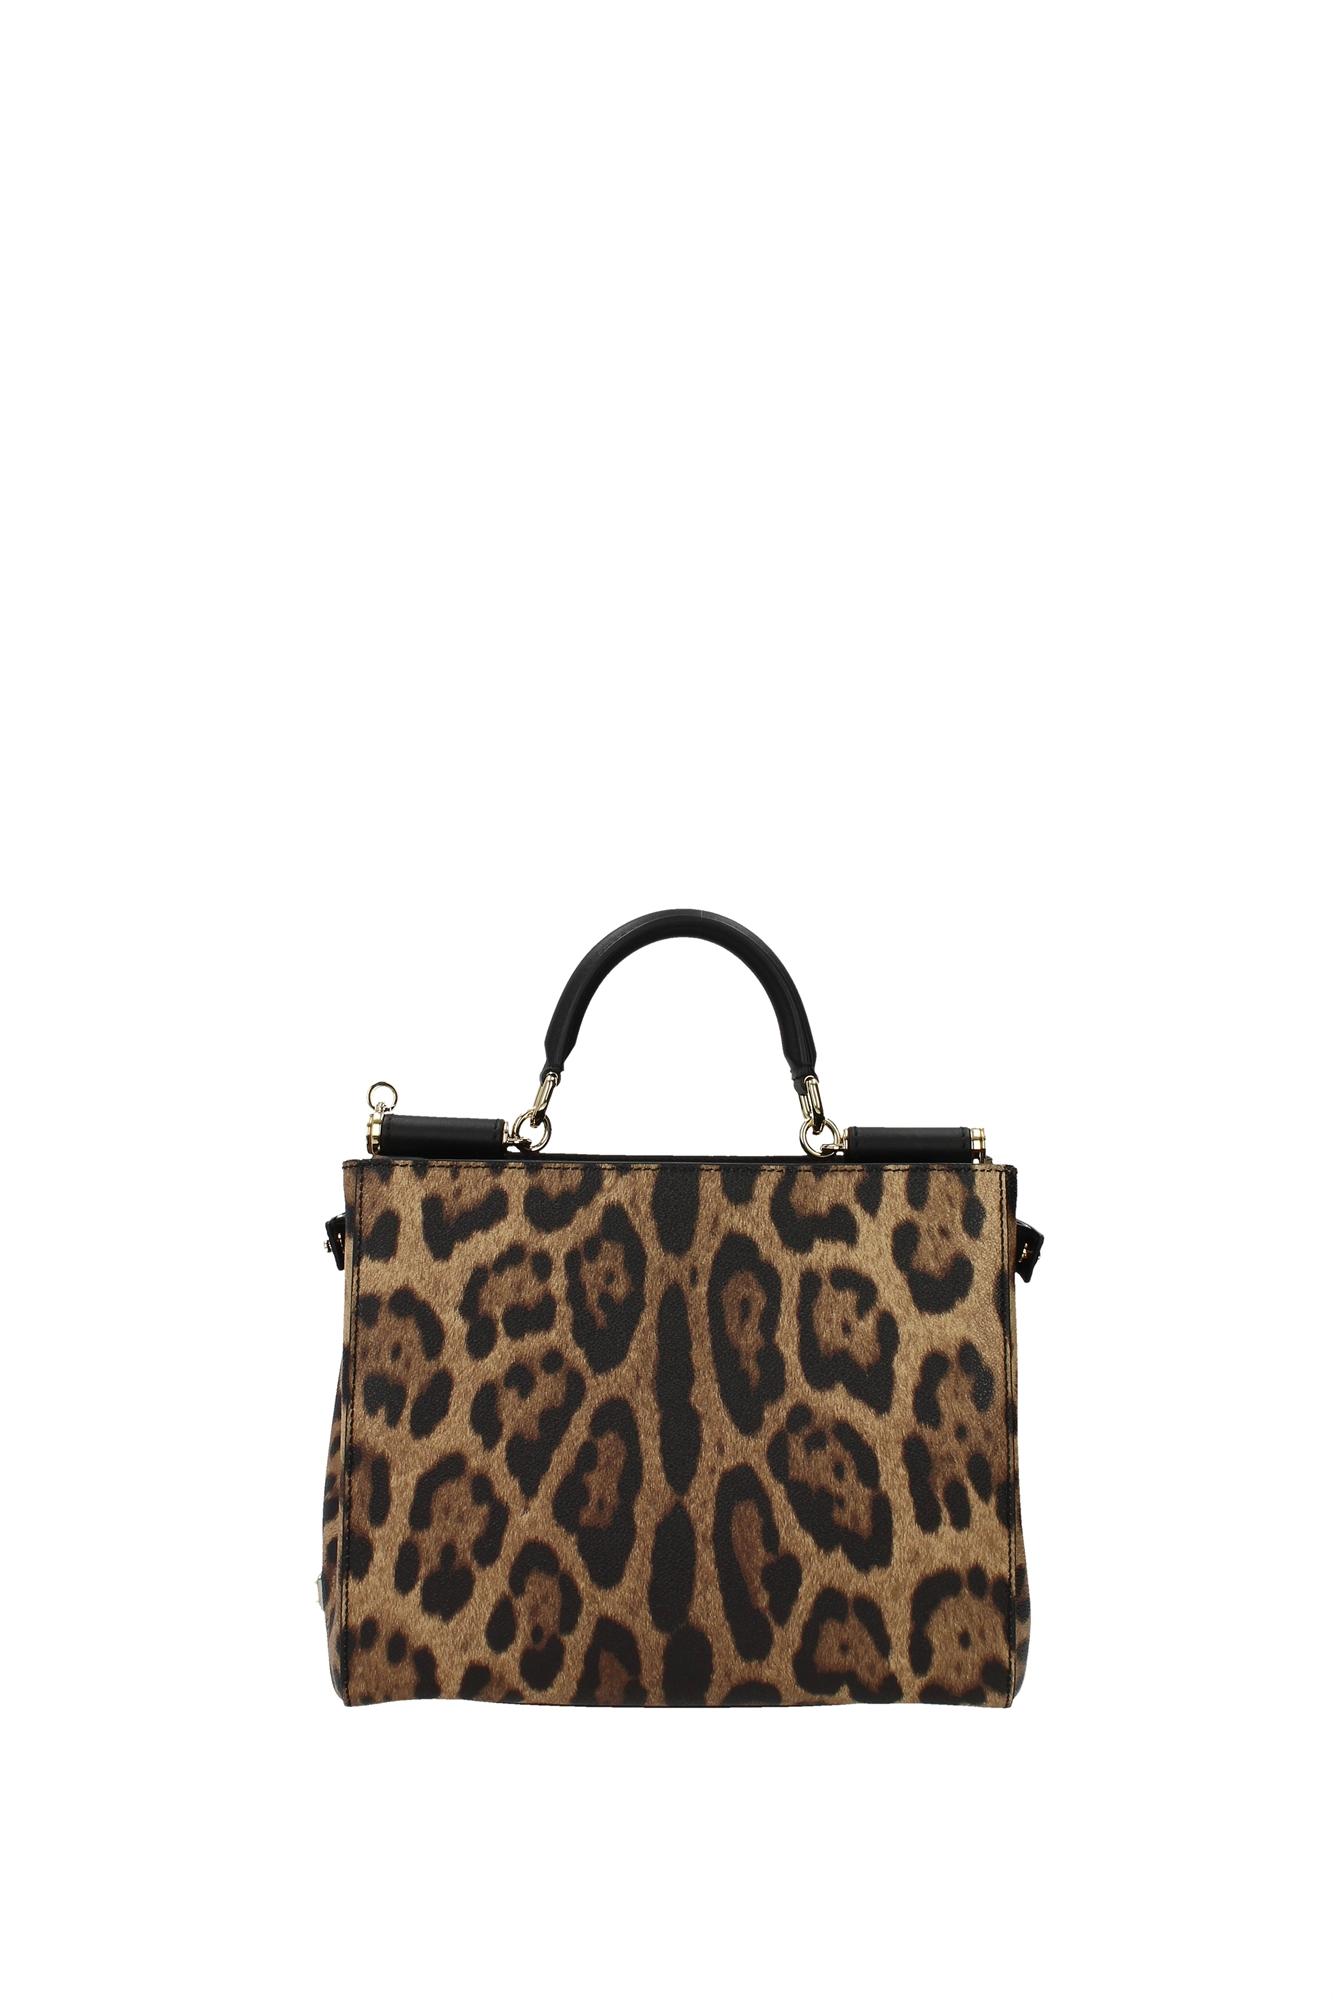 handtasche dolce gabbana damen stoff beige bb5966a71588s193 ebay. Black Bedroom Furniture Sets. Home Design Ideas